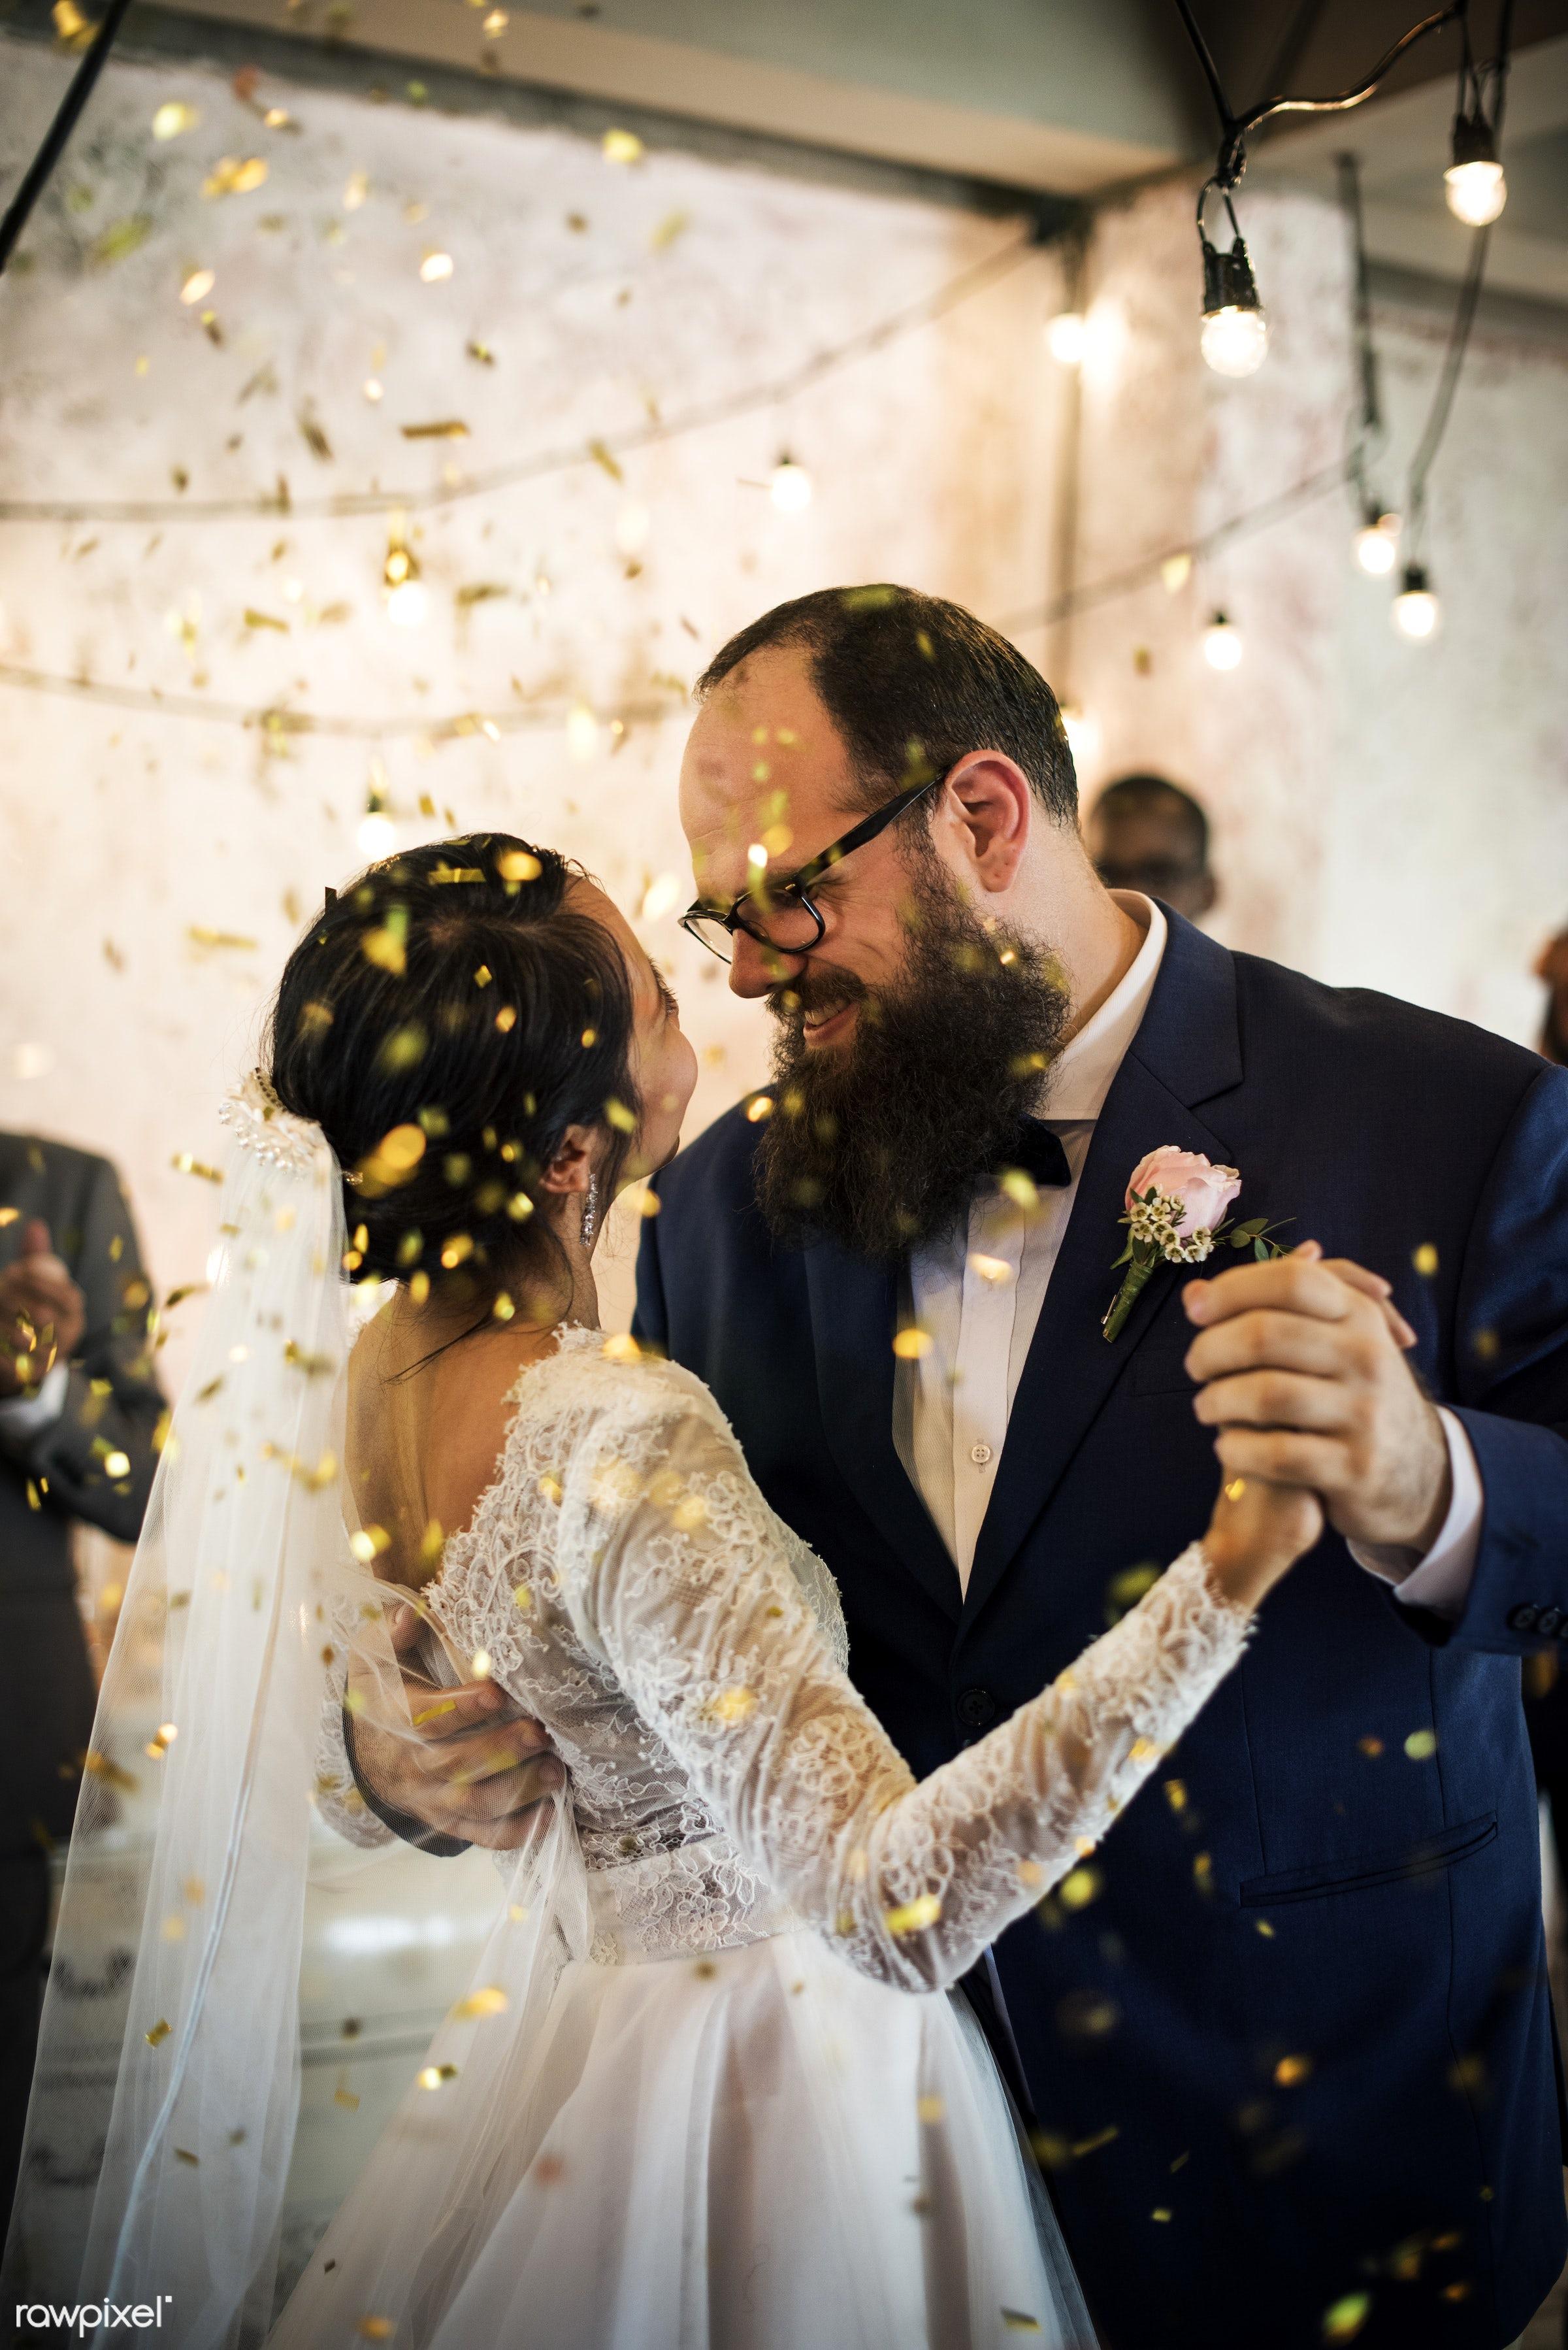 wedding, asian bride, banquet, caucasian groom, celebration, ceremony, cheerful, closeup, confetti, dance, fiance, gala,...